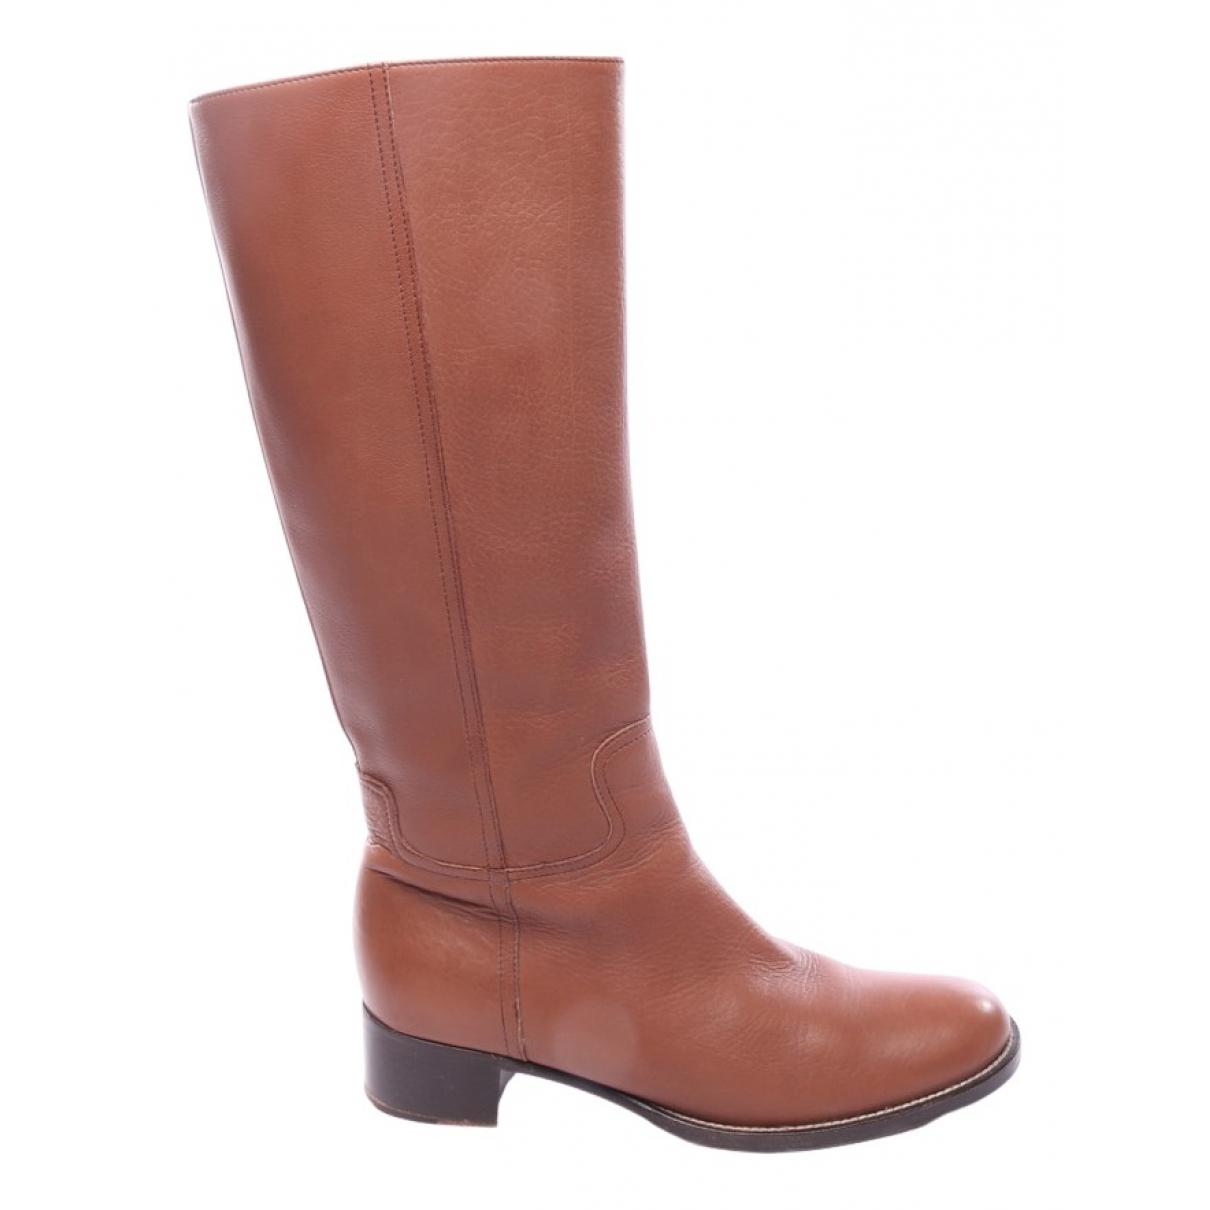 Miu Miu \N Brown Leather Boots for Women 40.5 EU